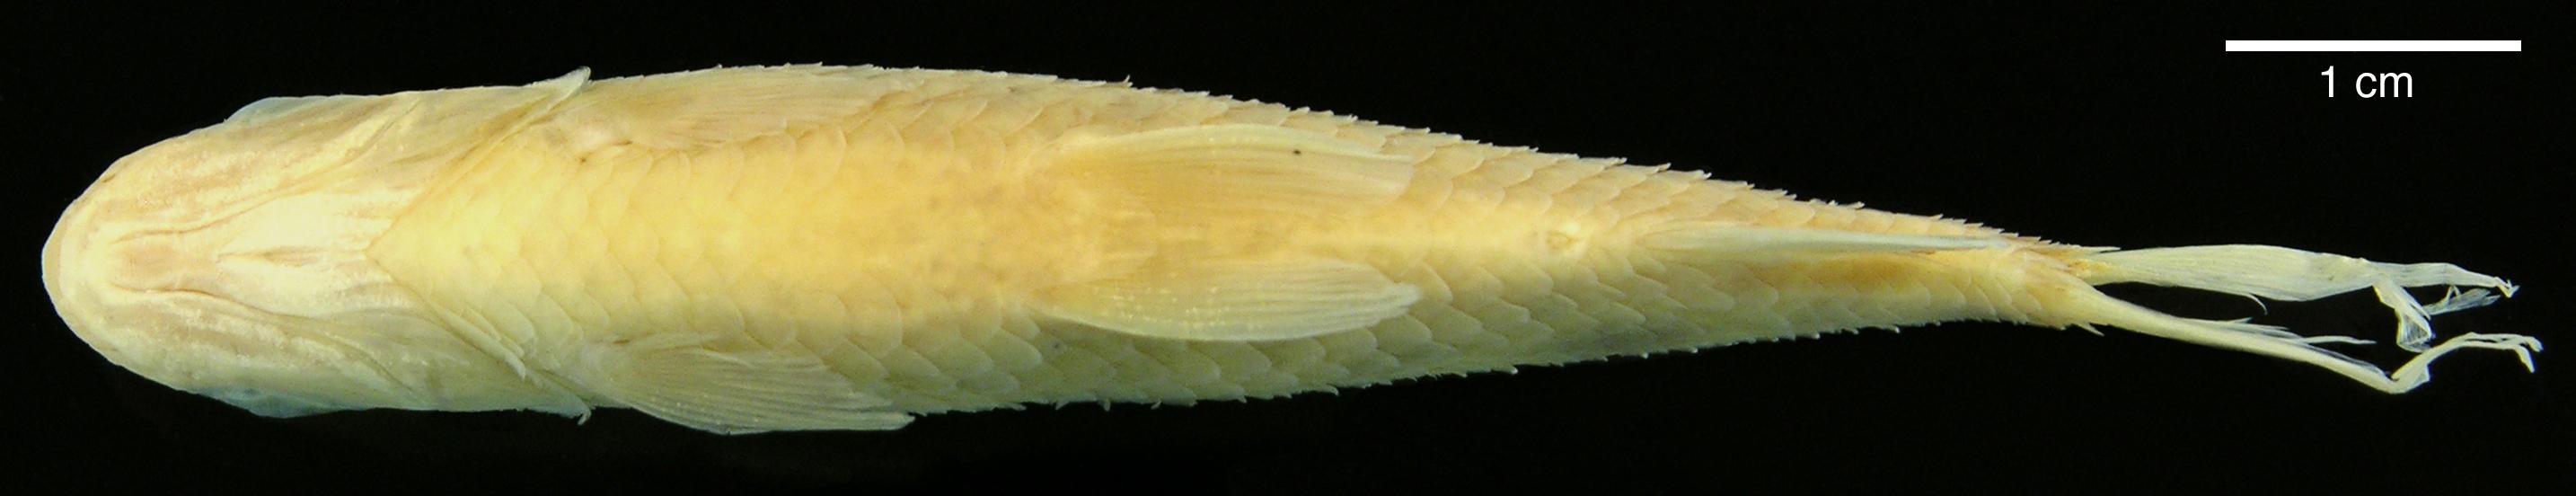 Paratype of <em>Leporinus boehlkei</em>, IAvH-P-10562_Ventral, 70.2 mm SL (scale bar = 1 cm). Photograph by M. H. Sabaj Pérez